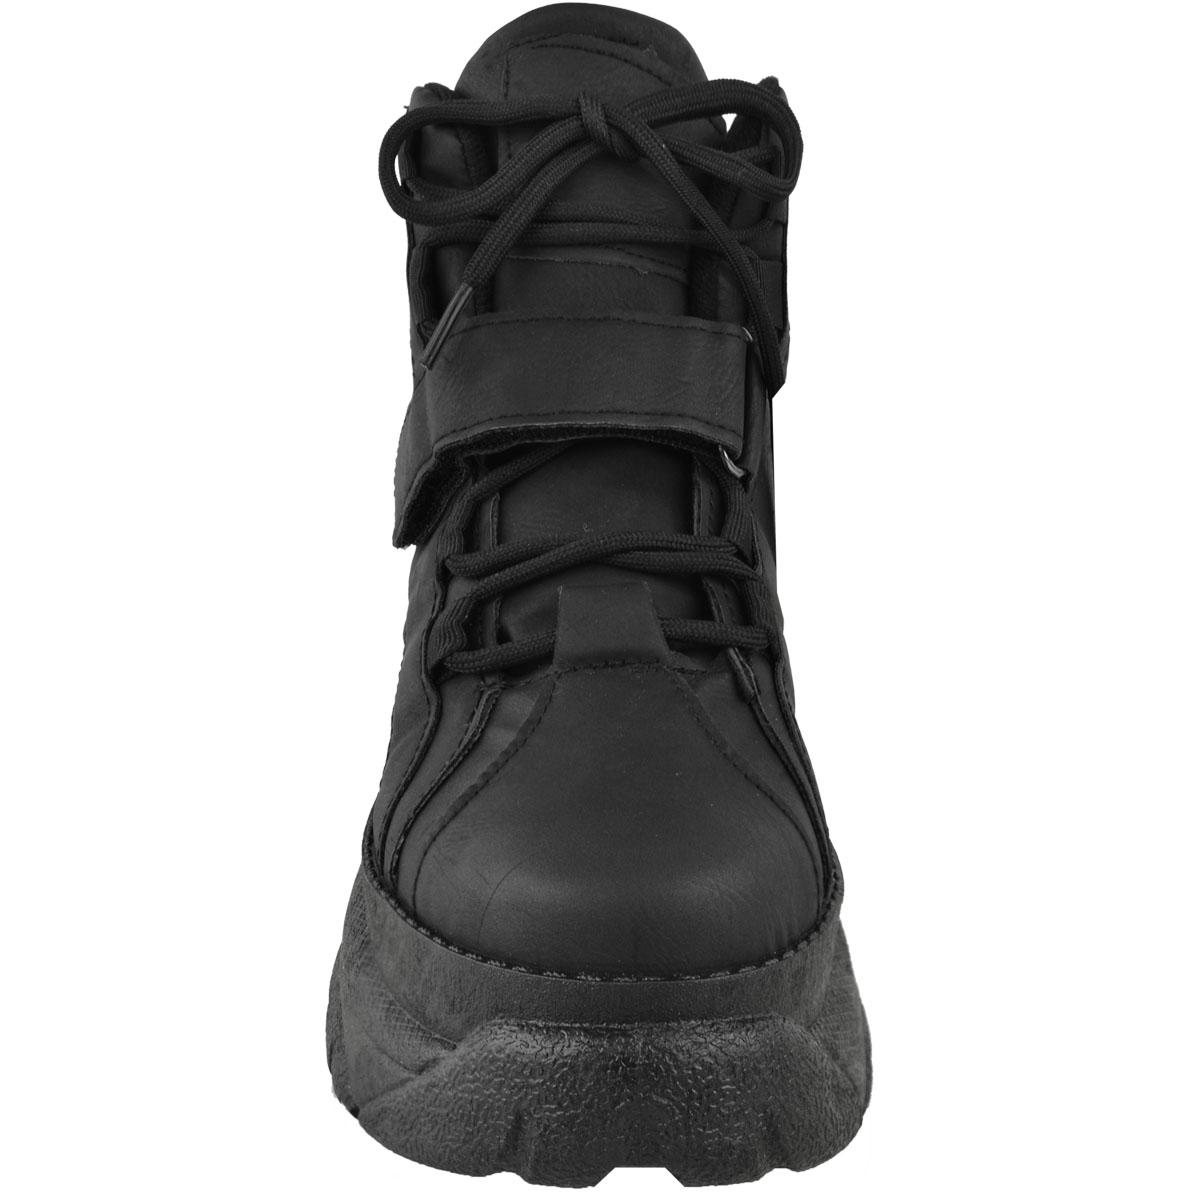 Womens-Ladies-High-Platform-Trainers-Sneakers-Retro-Boots-Hi-Top-Wedge-Punk-Goth thumbnail 6